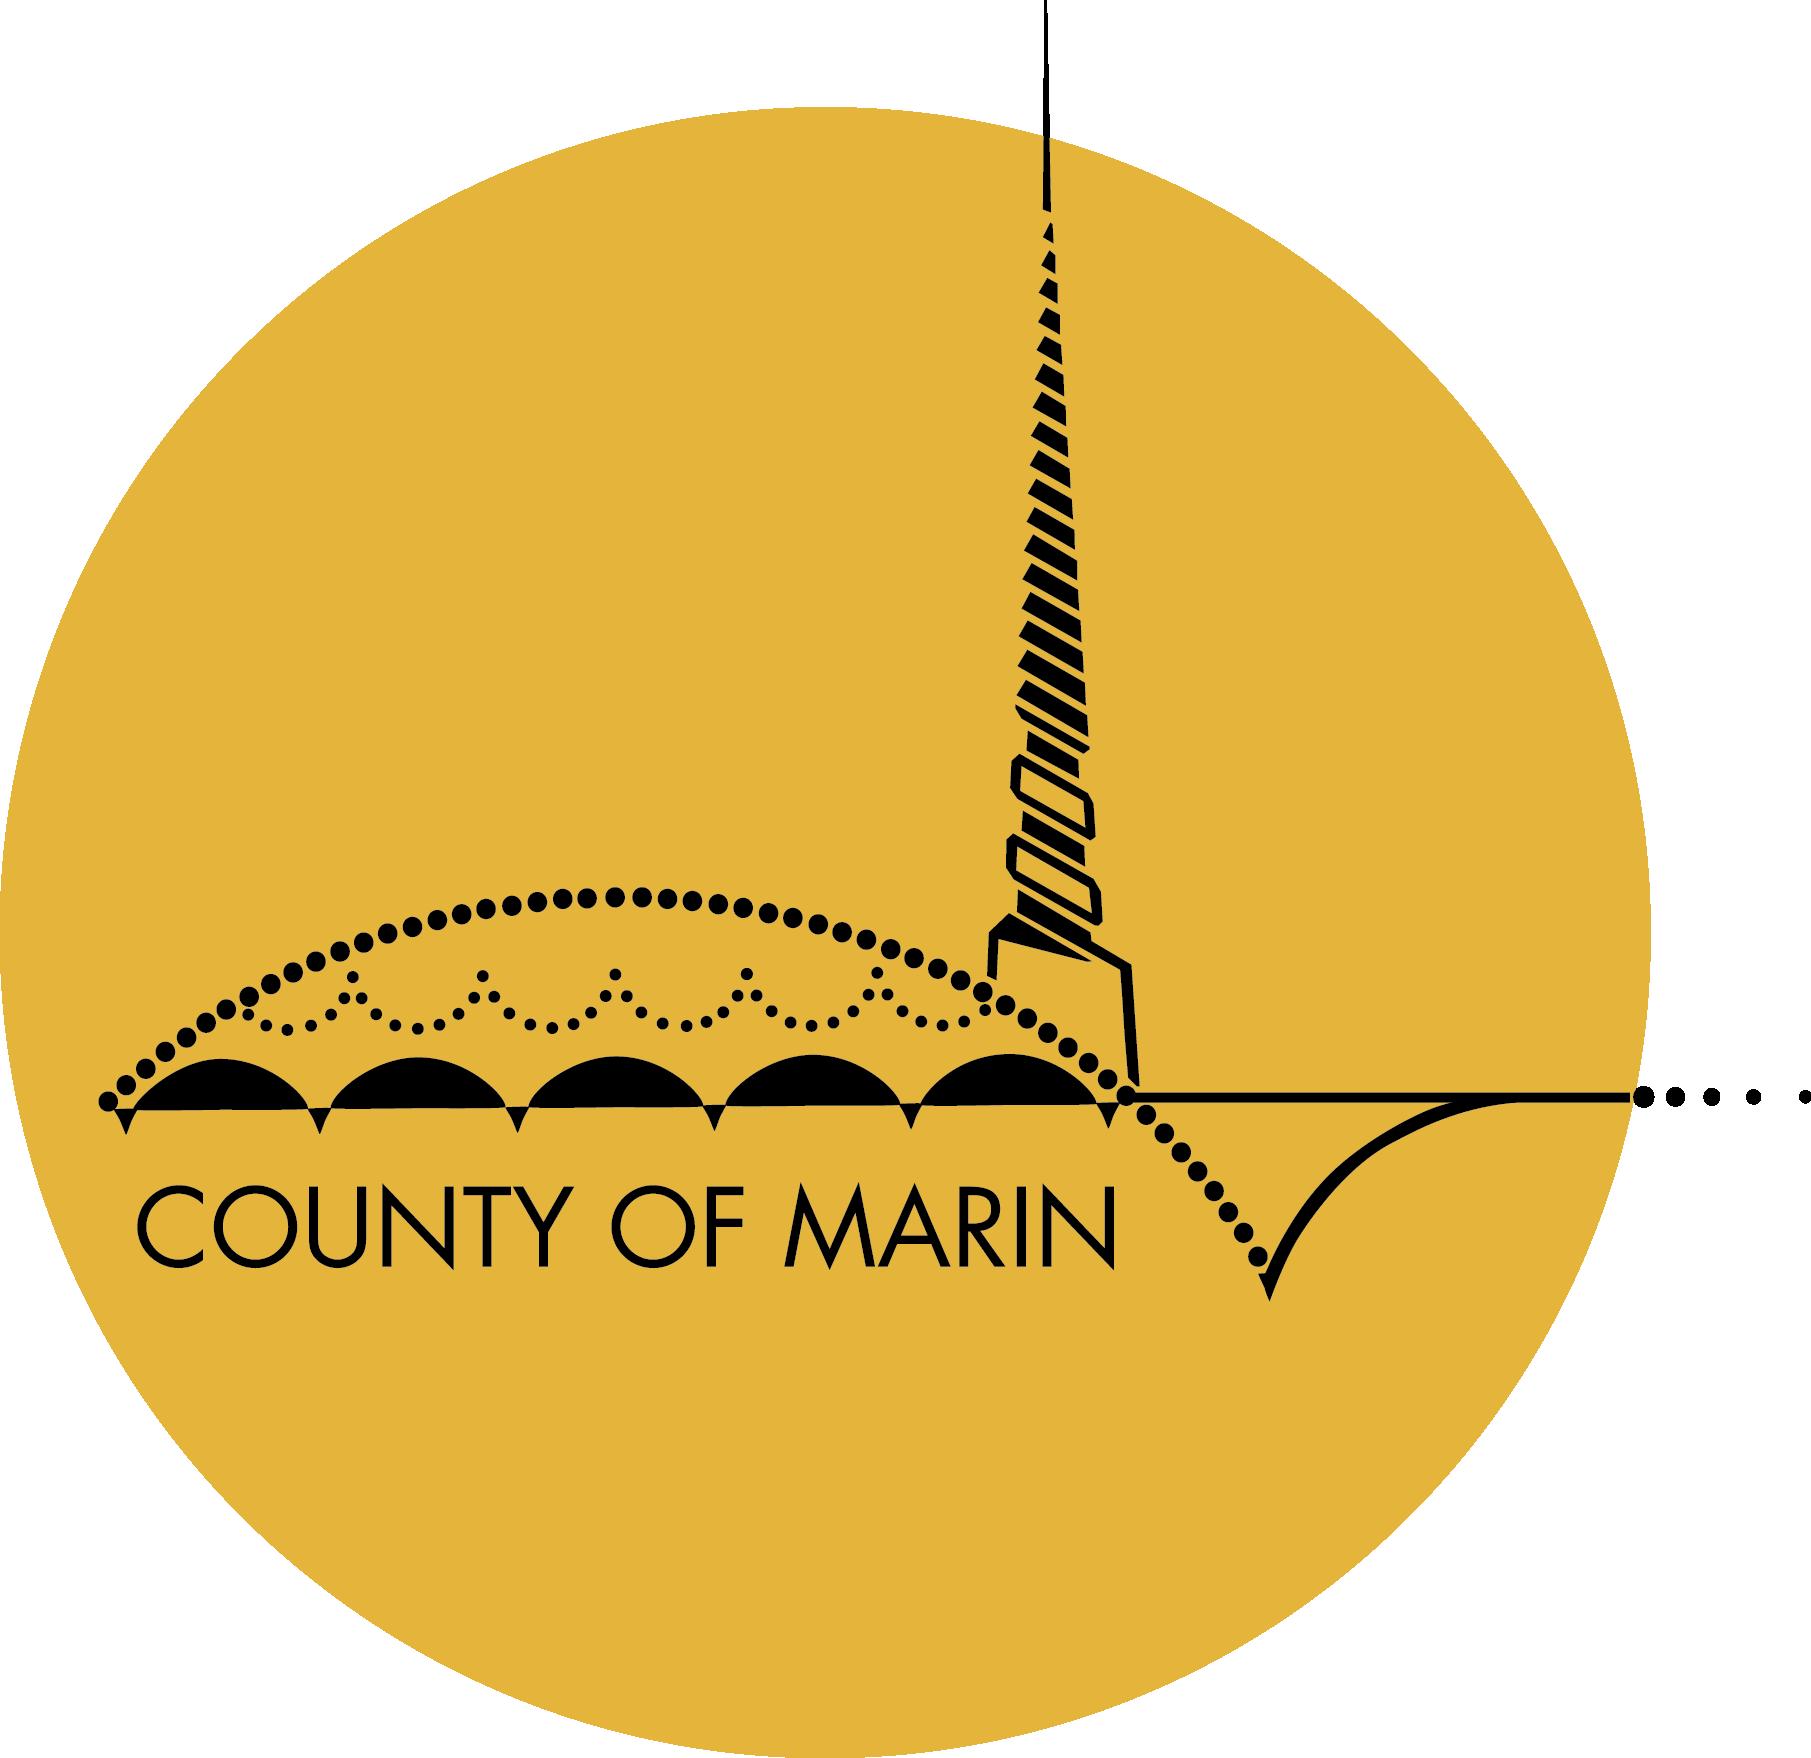 County of Marin Gold Seal Logo